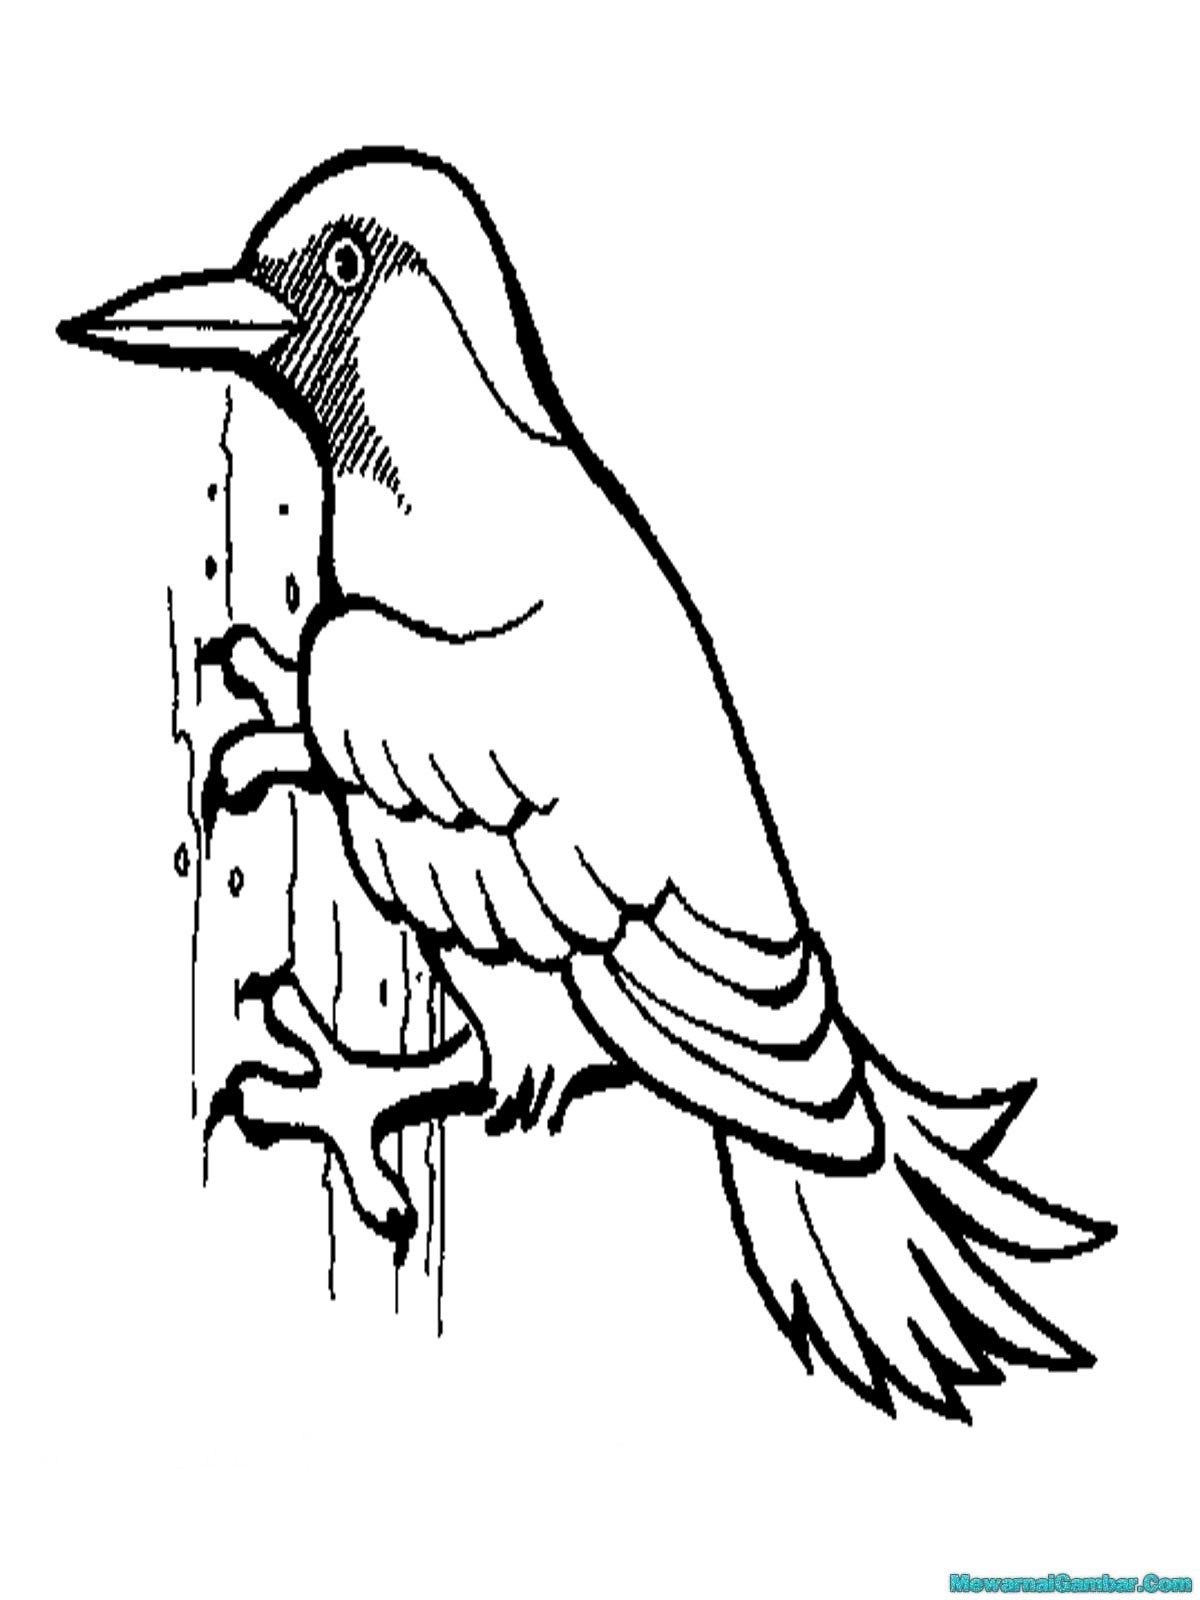 Mewarnai Gambar Burung Merpati Mewarnai Gambar Amatcardco